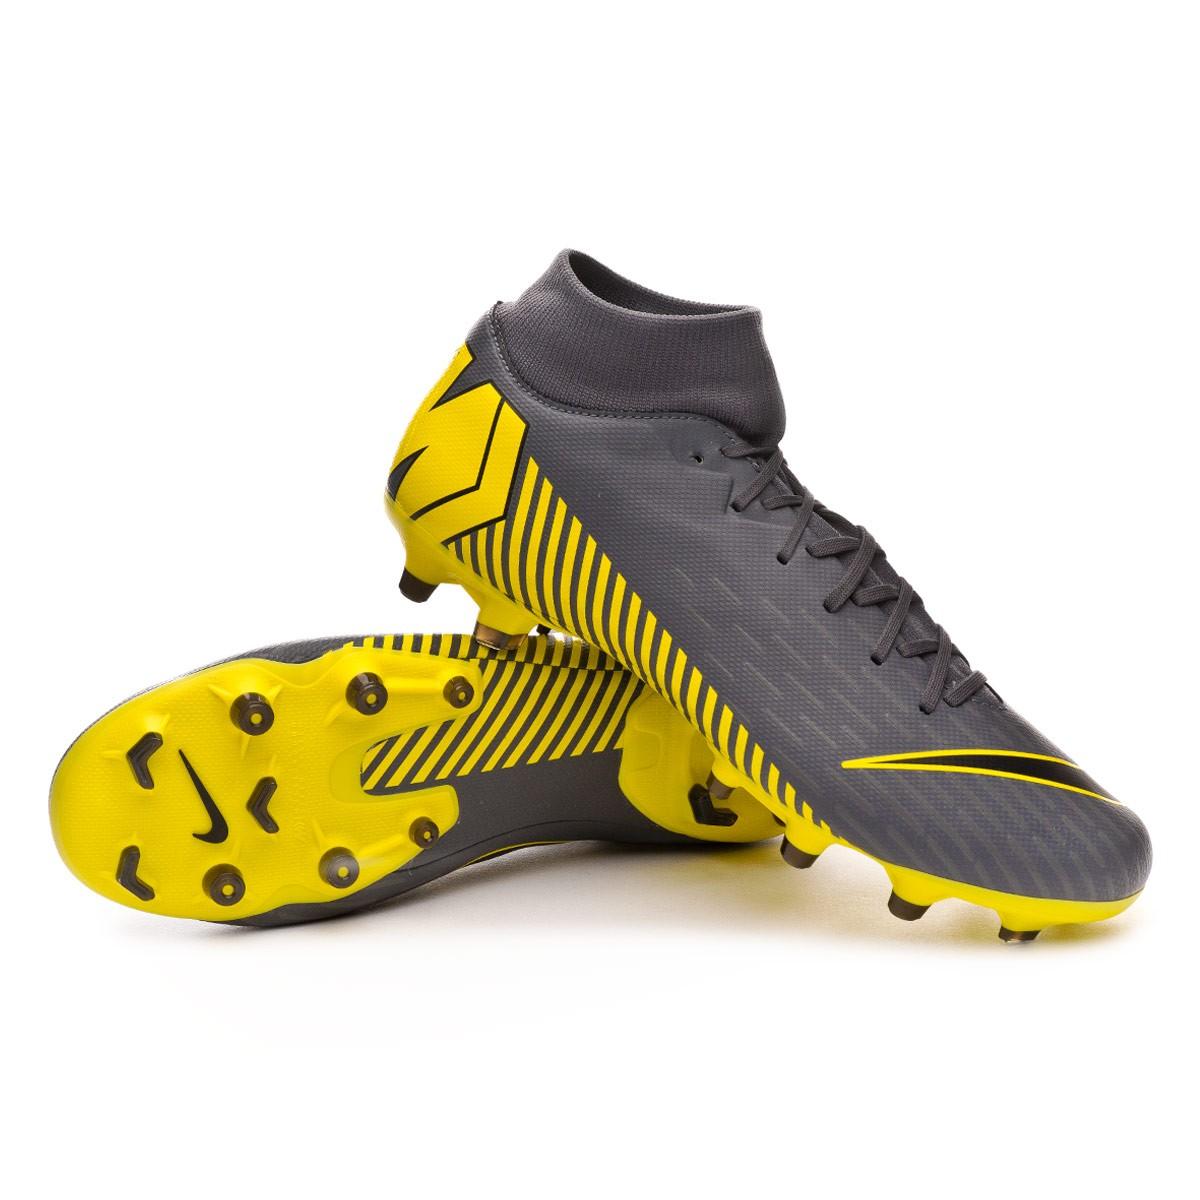 fd988fce1d2c Football Boots Nike Mercurial Superfly VI Academy MG Dark grey-Black ...